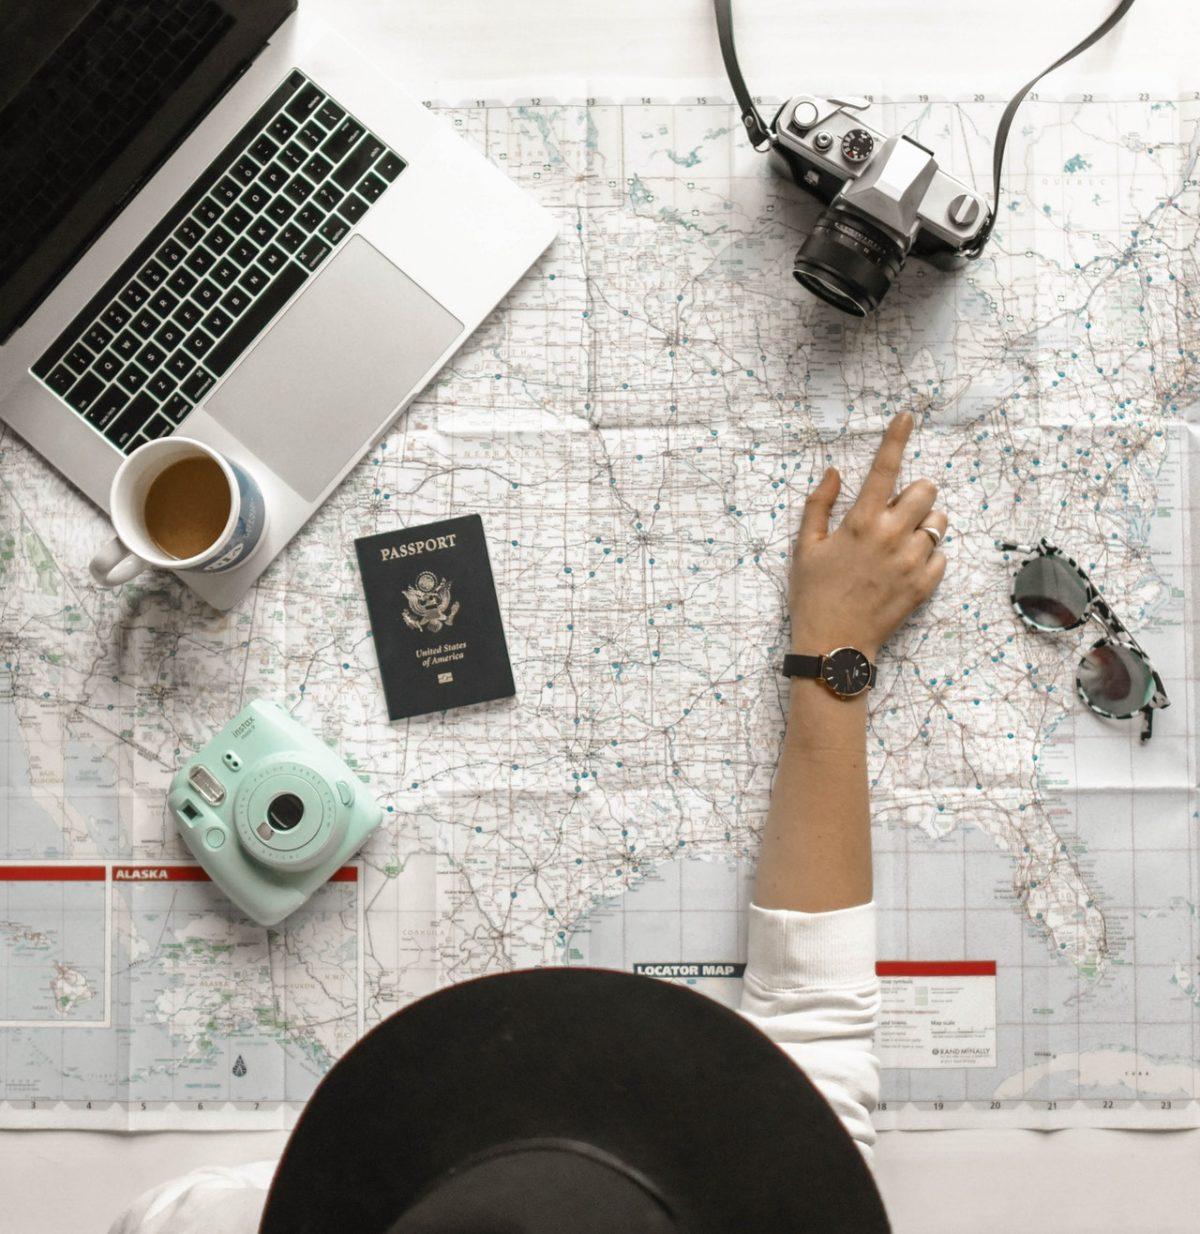 Tools Of The Trade, Map, Passport, Laptop, Sunglasses, Camera